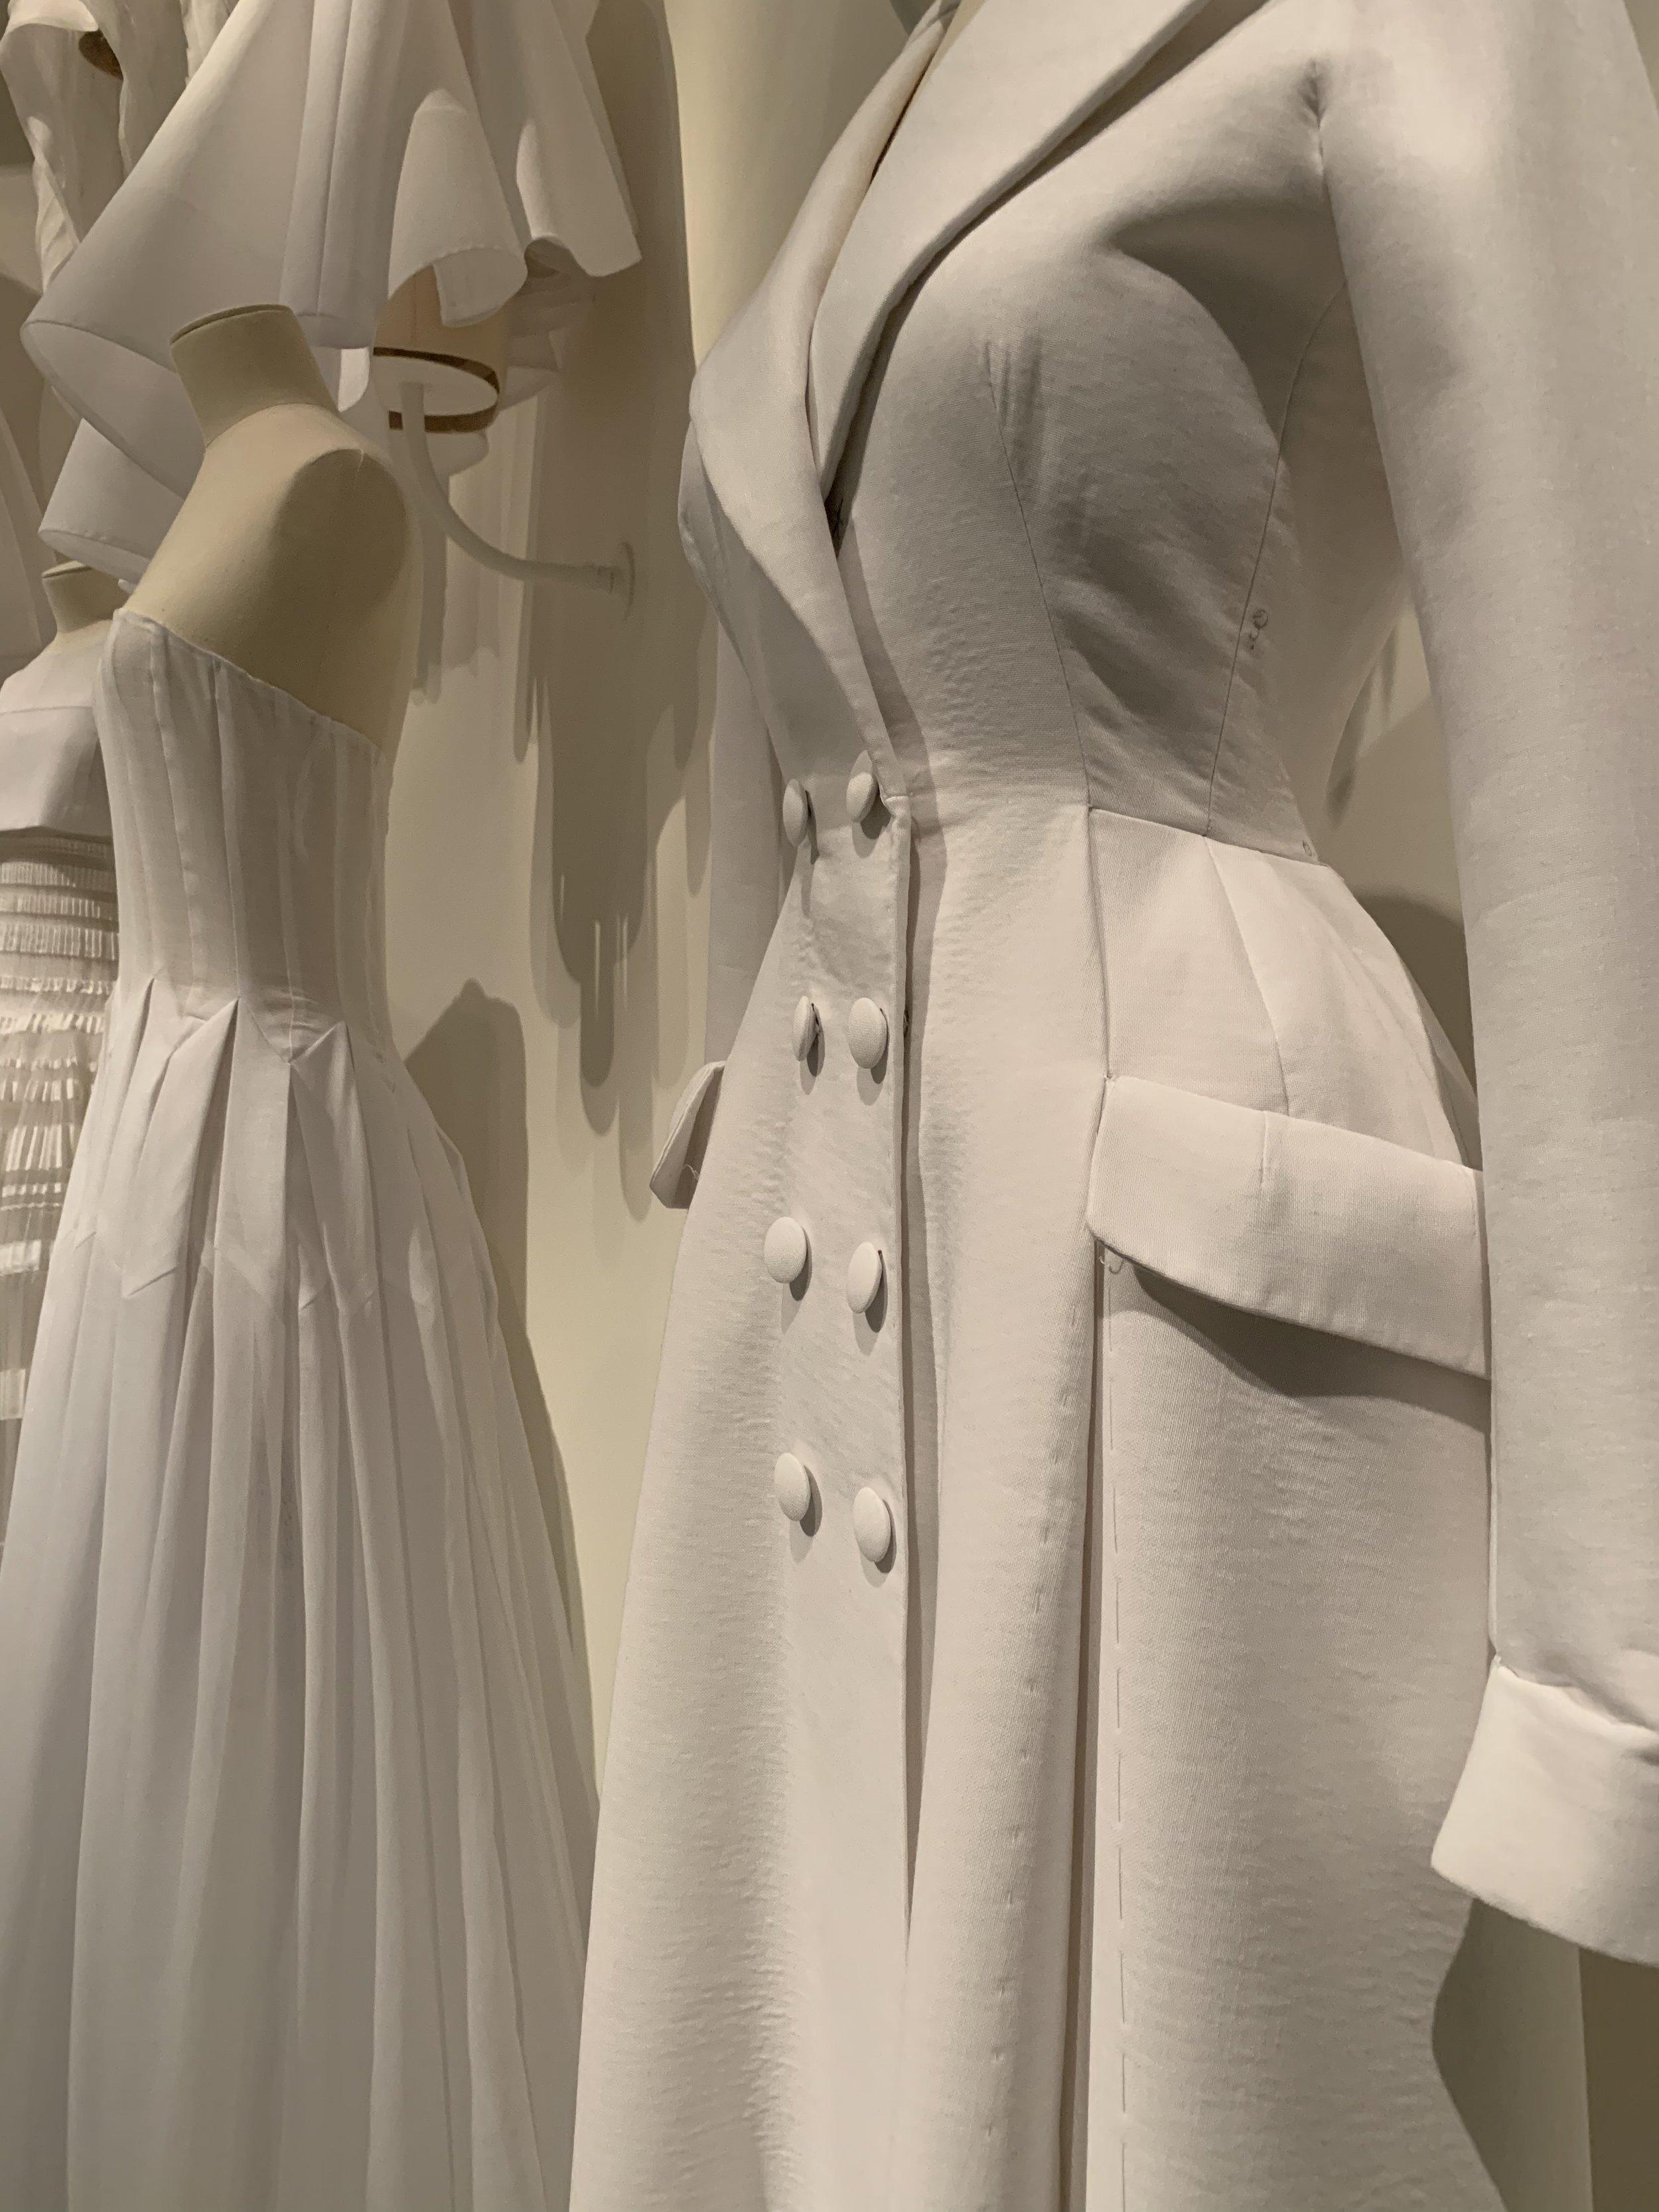 the Dior exhibit at the Denver Art Museum, 2019